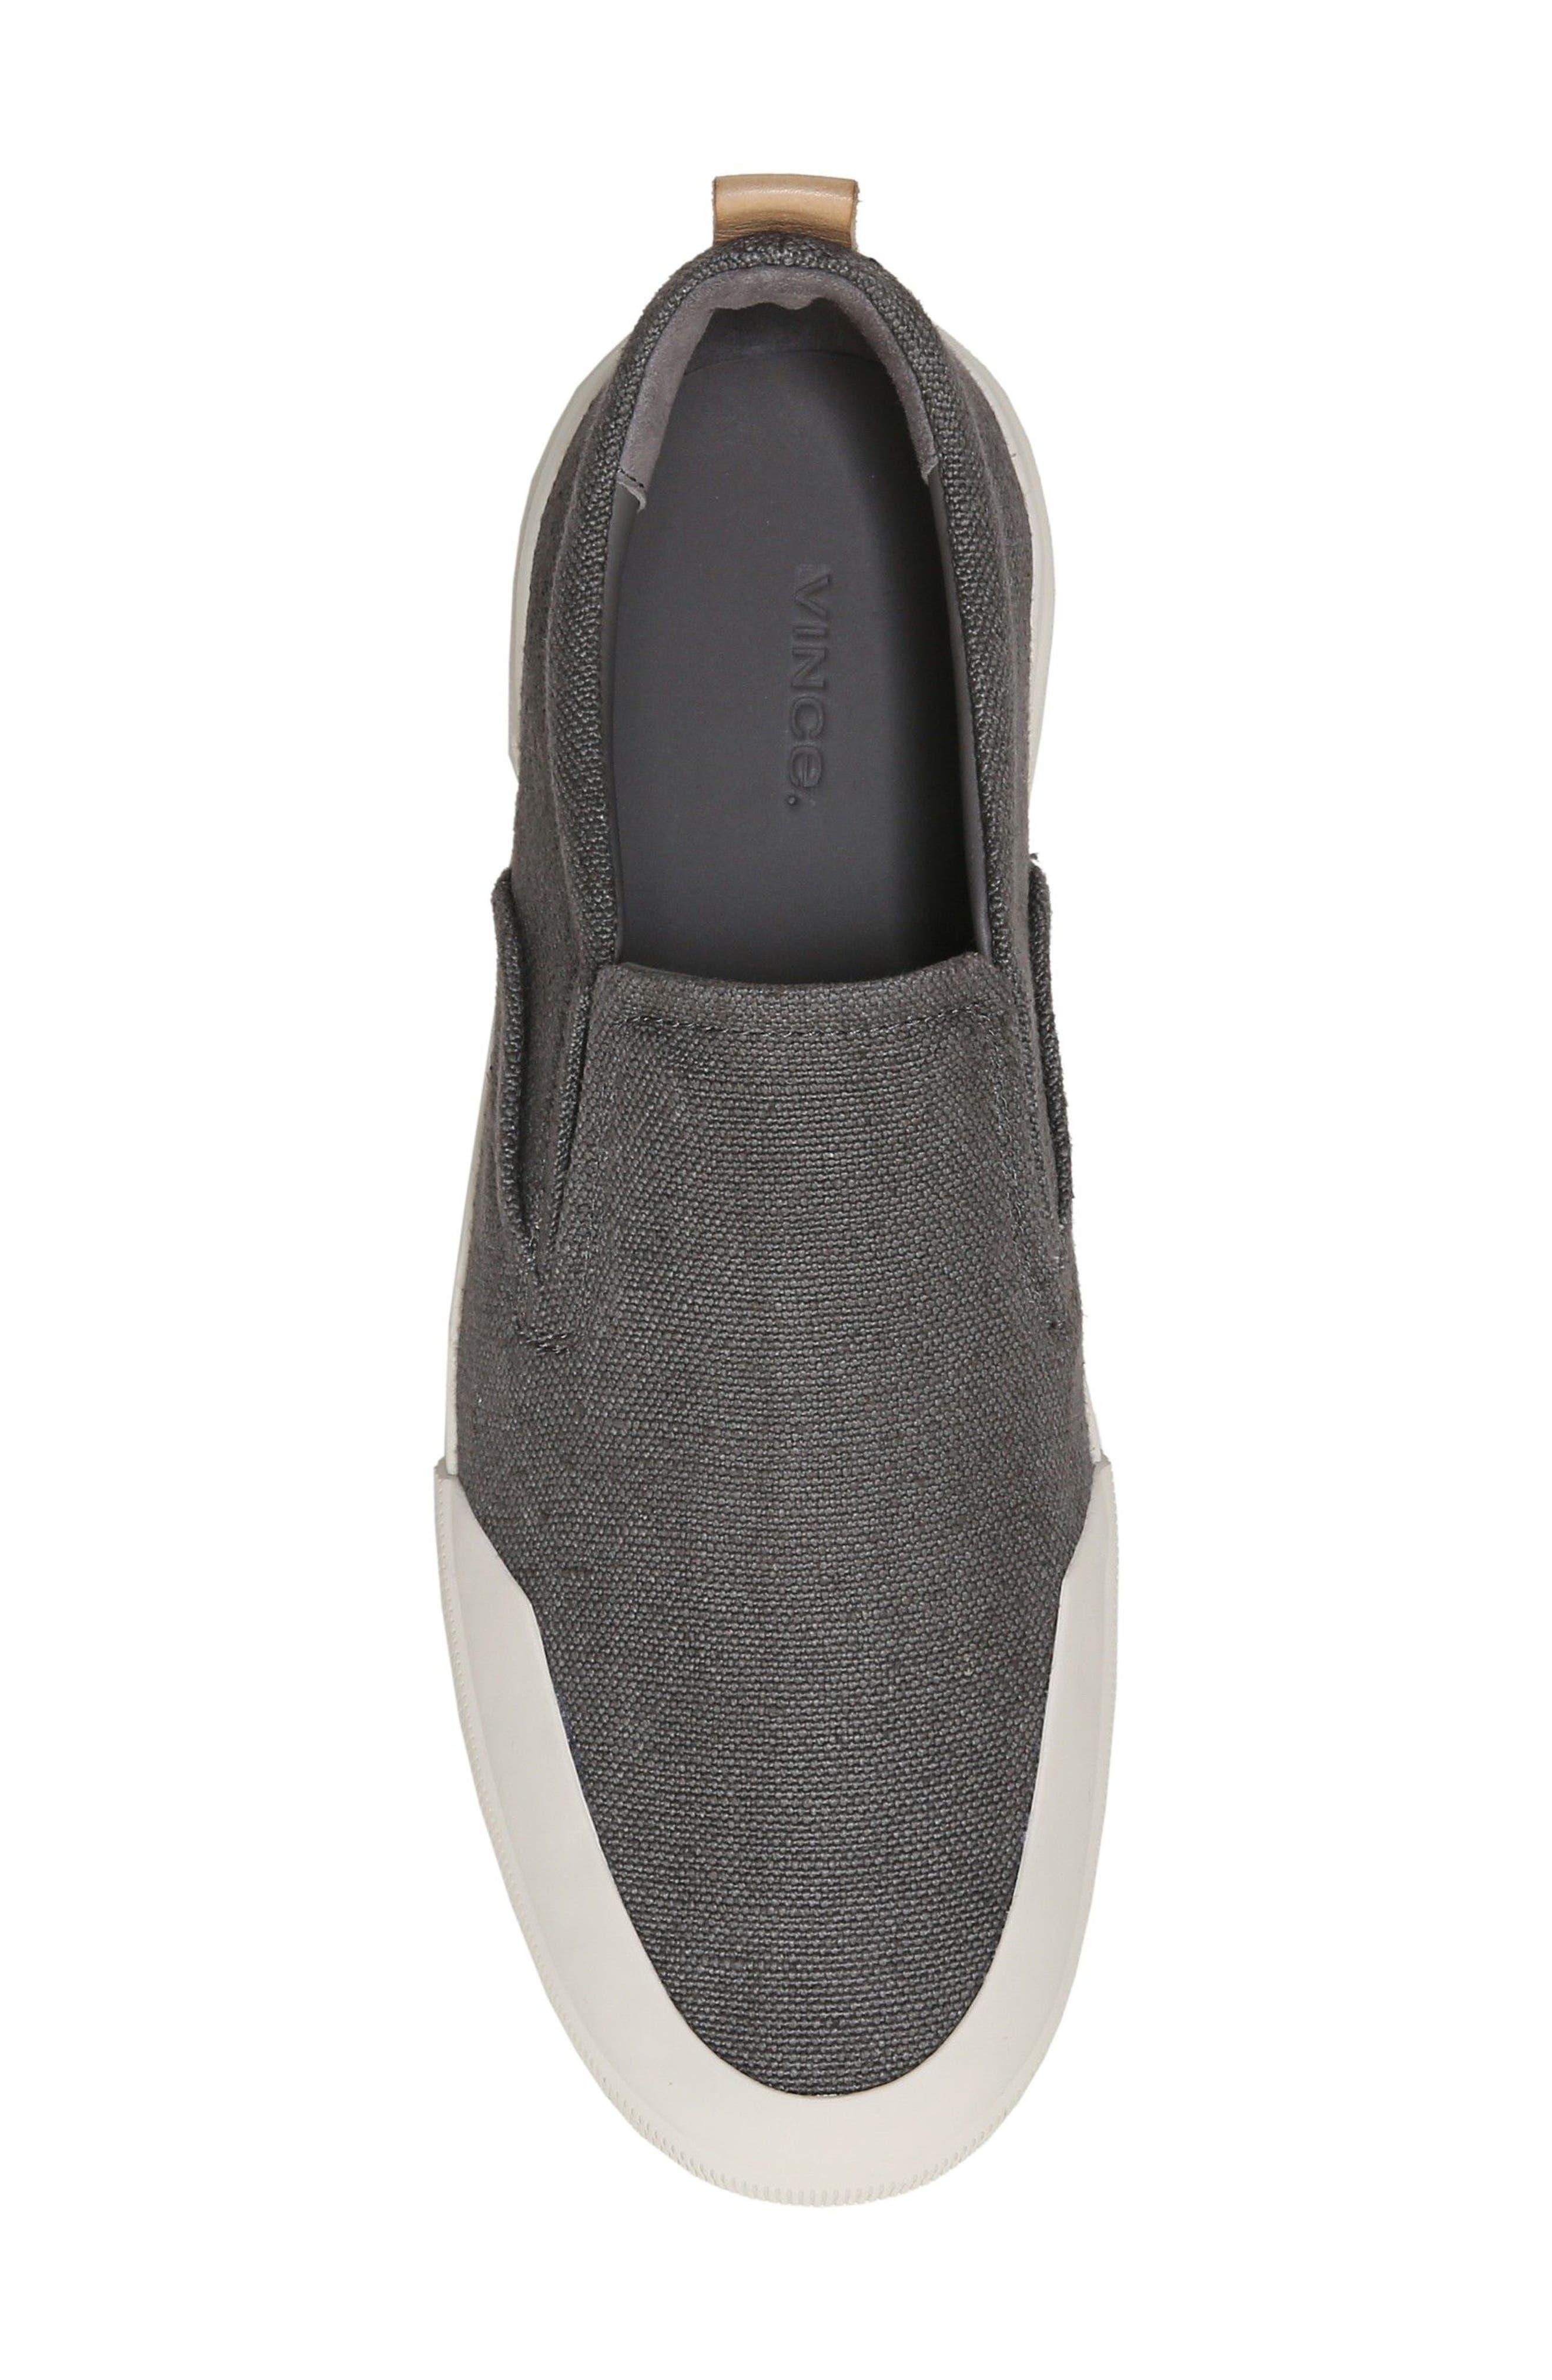 Vernon Slip-On Sneaker,                             Alternate thumbnail 5, color,                             Graphite/ Cuoio